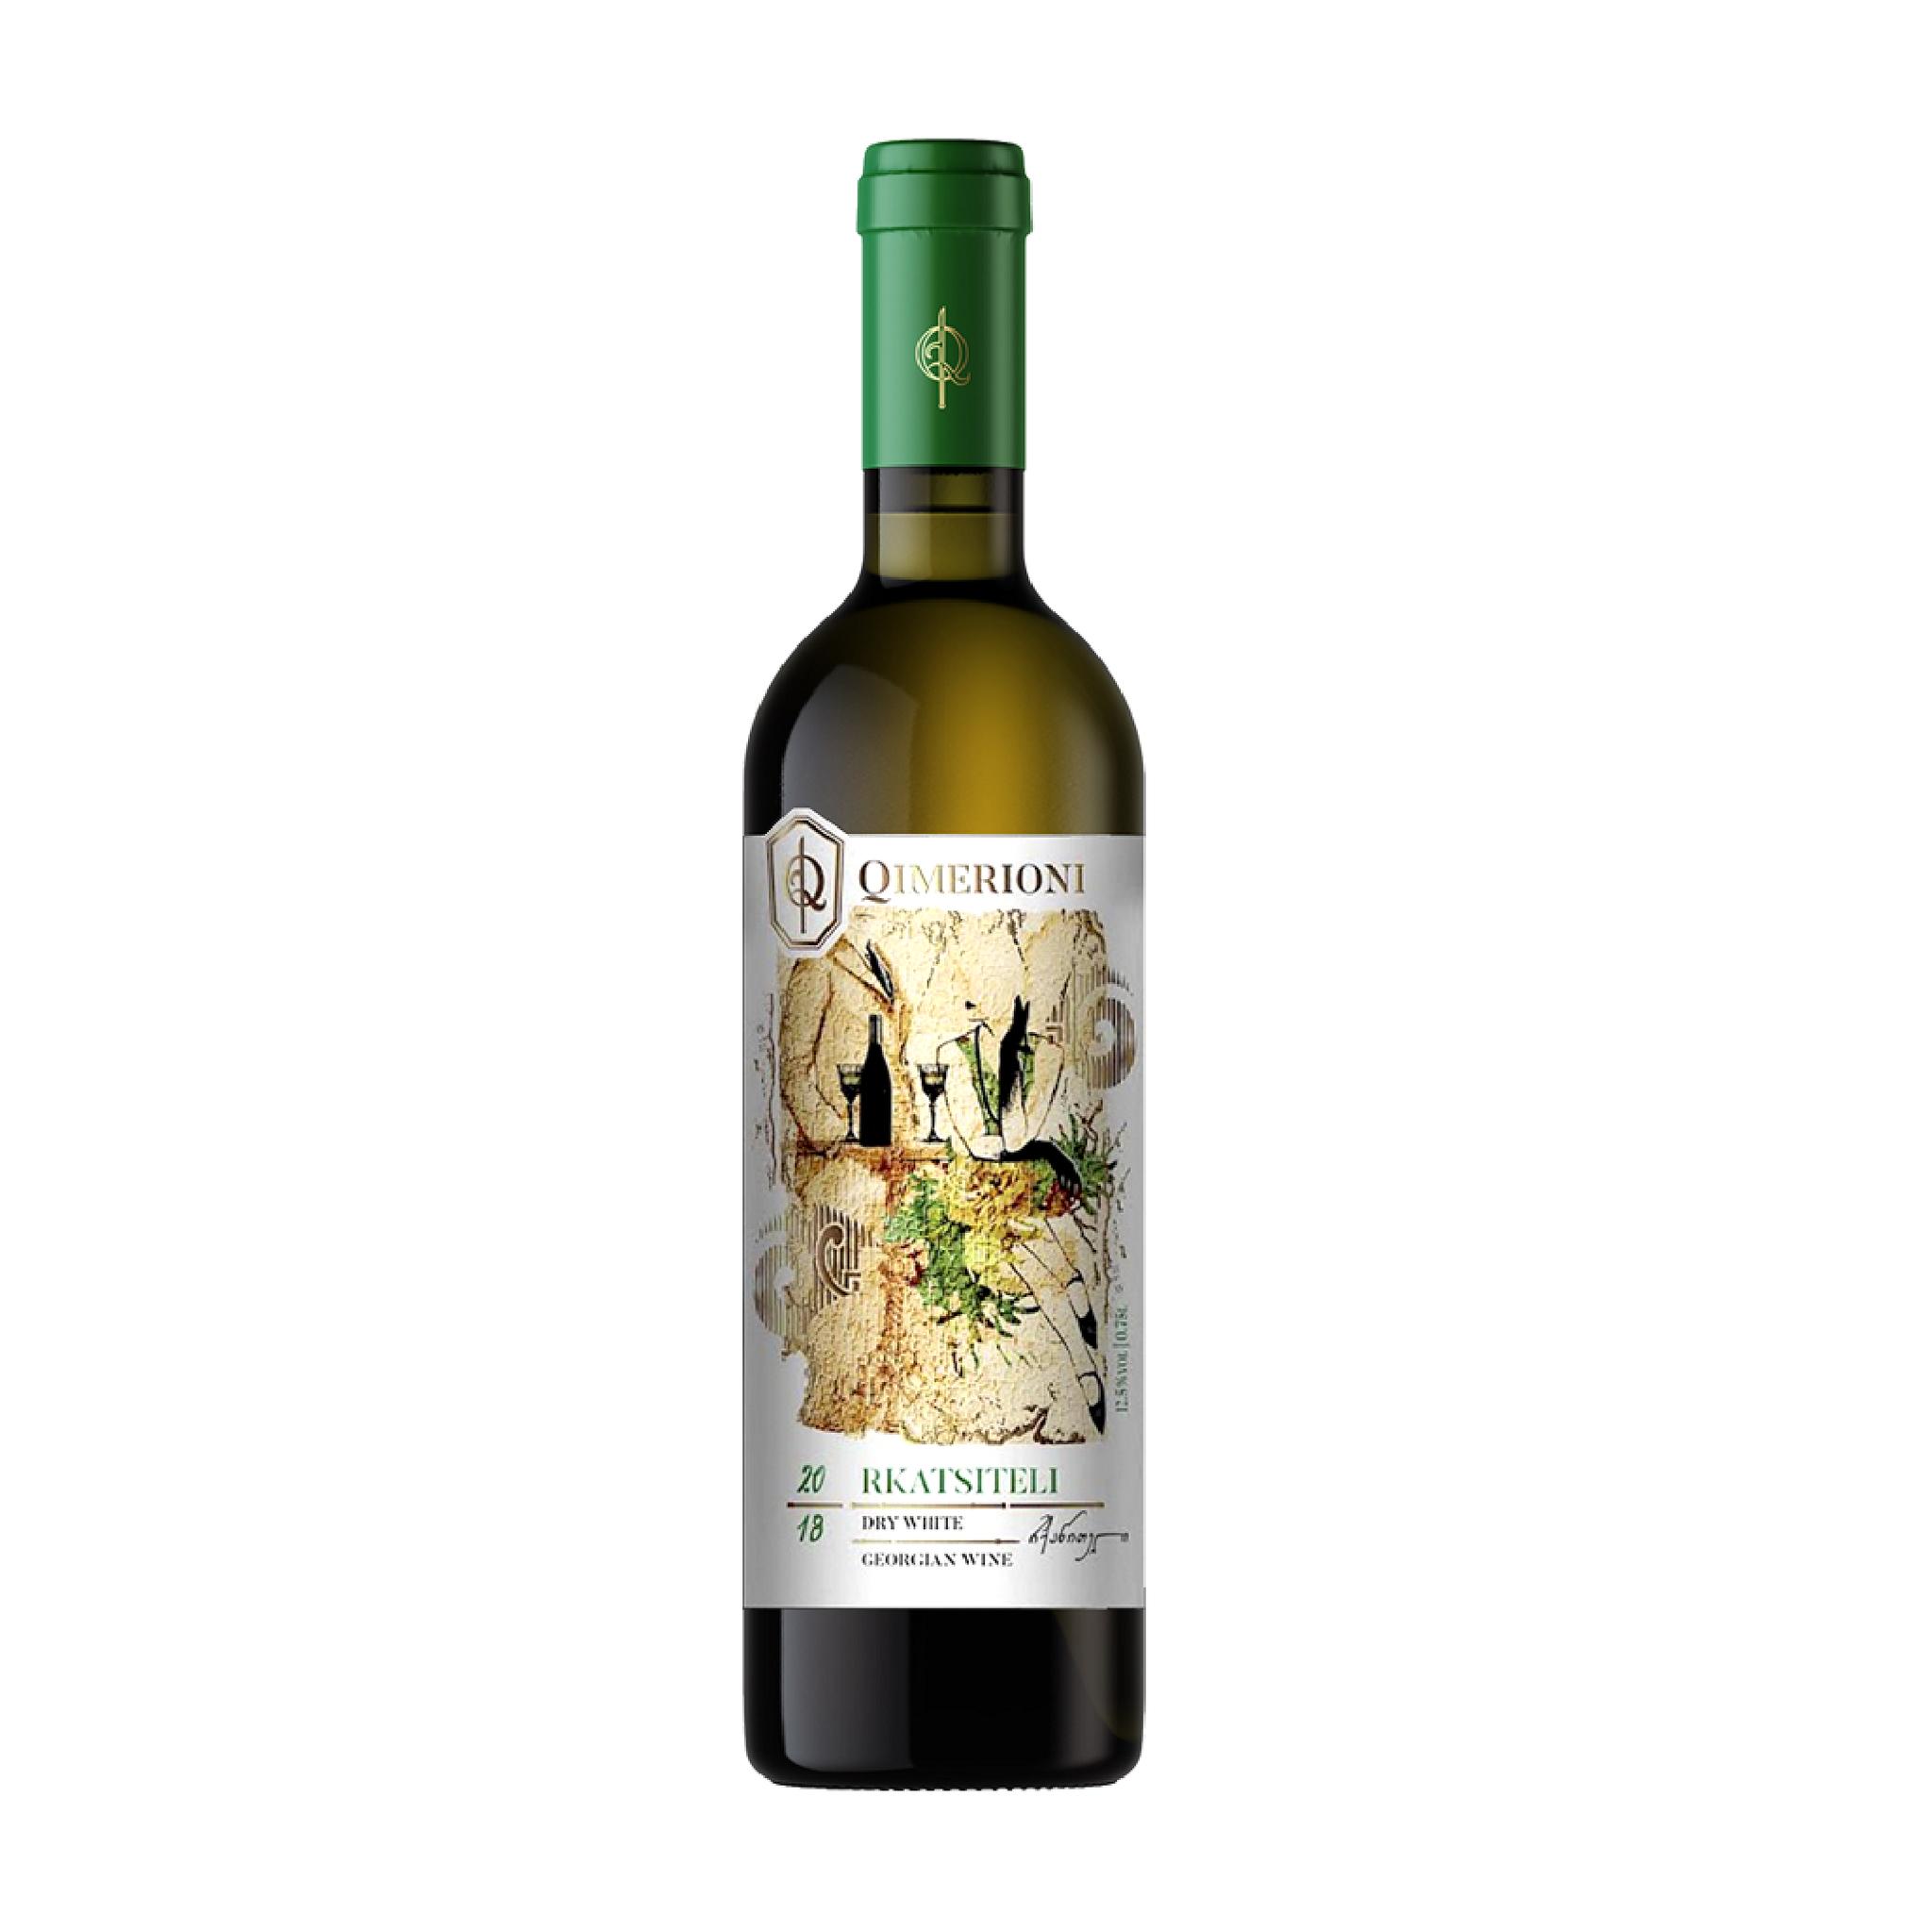 Вино Qimerioni Ркацетелі